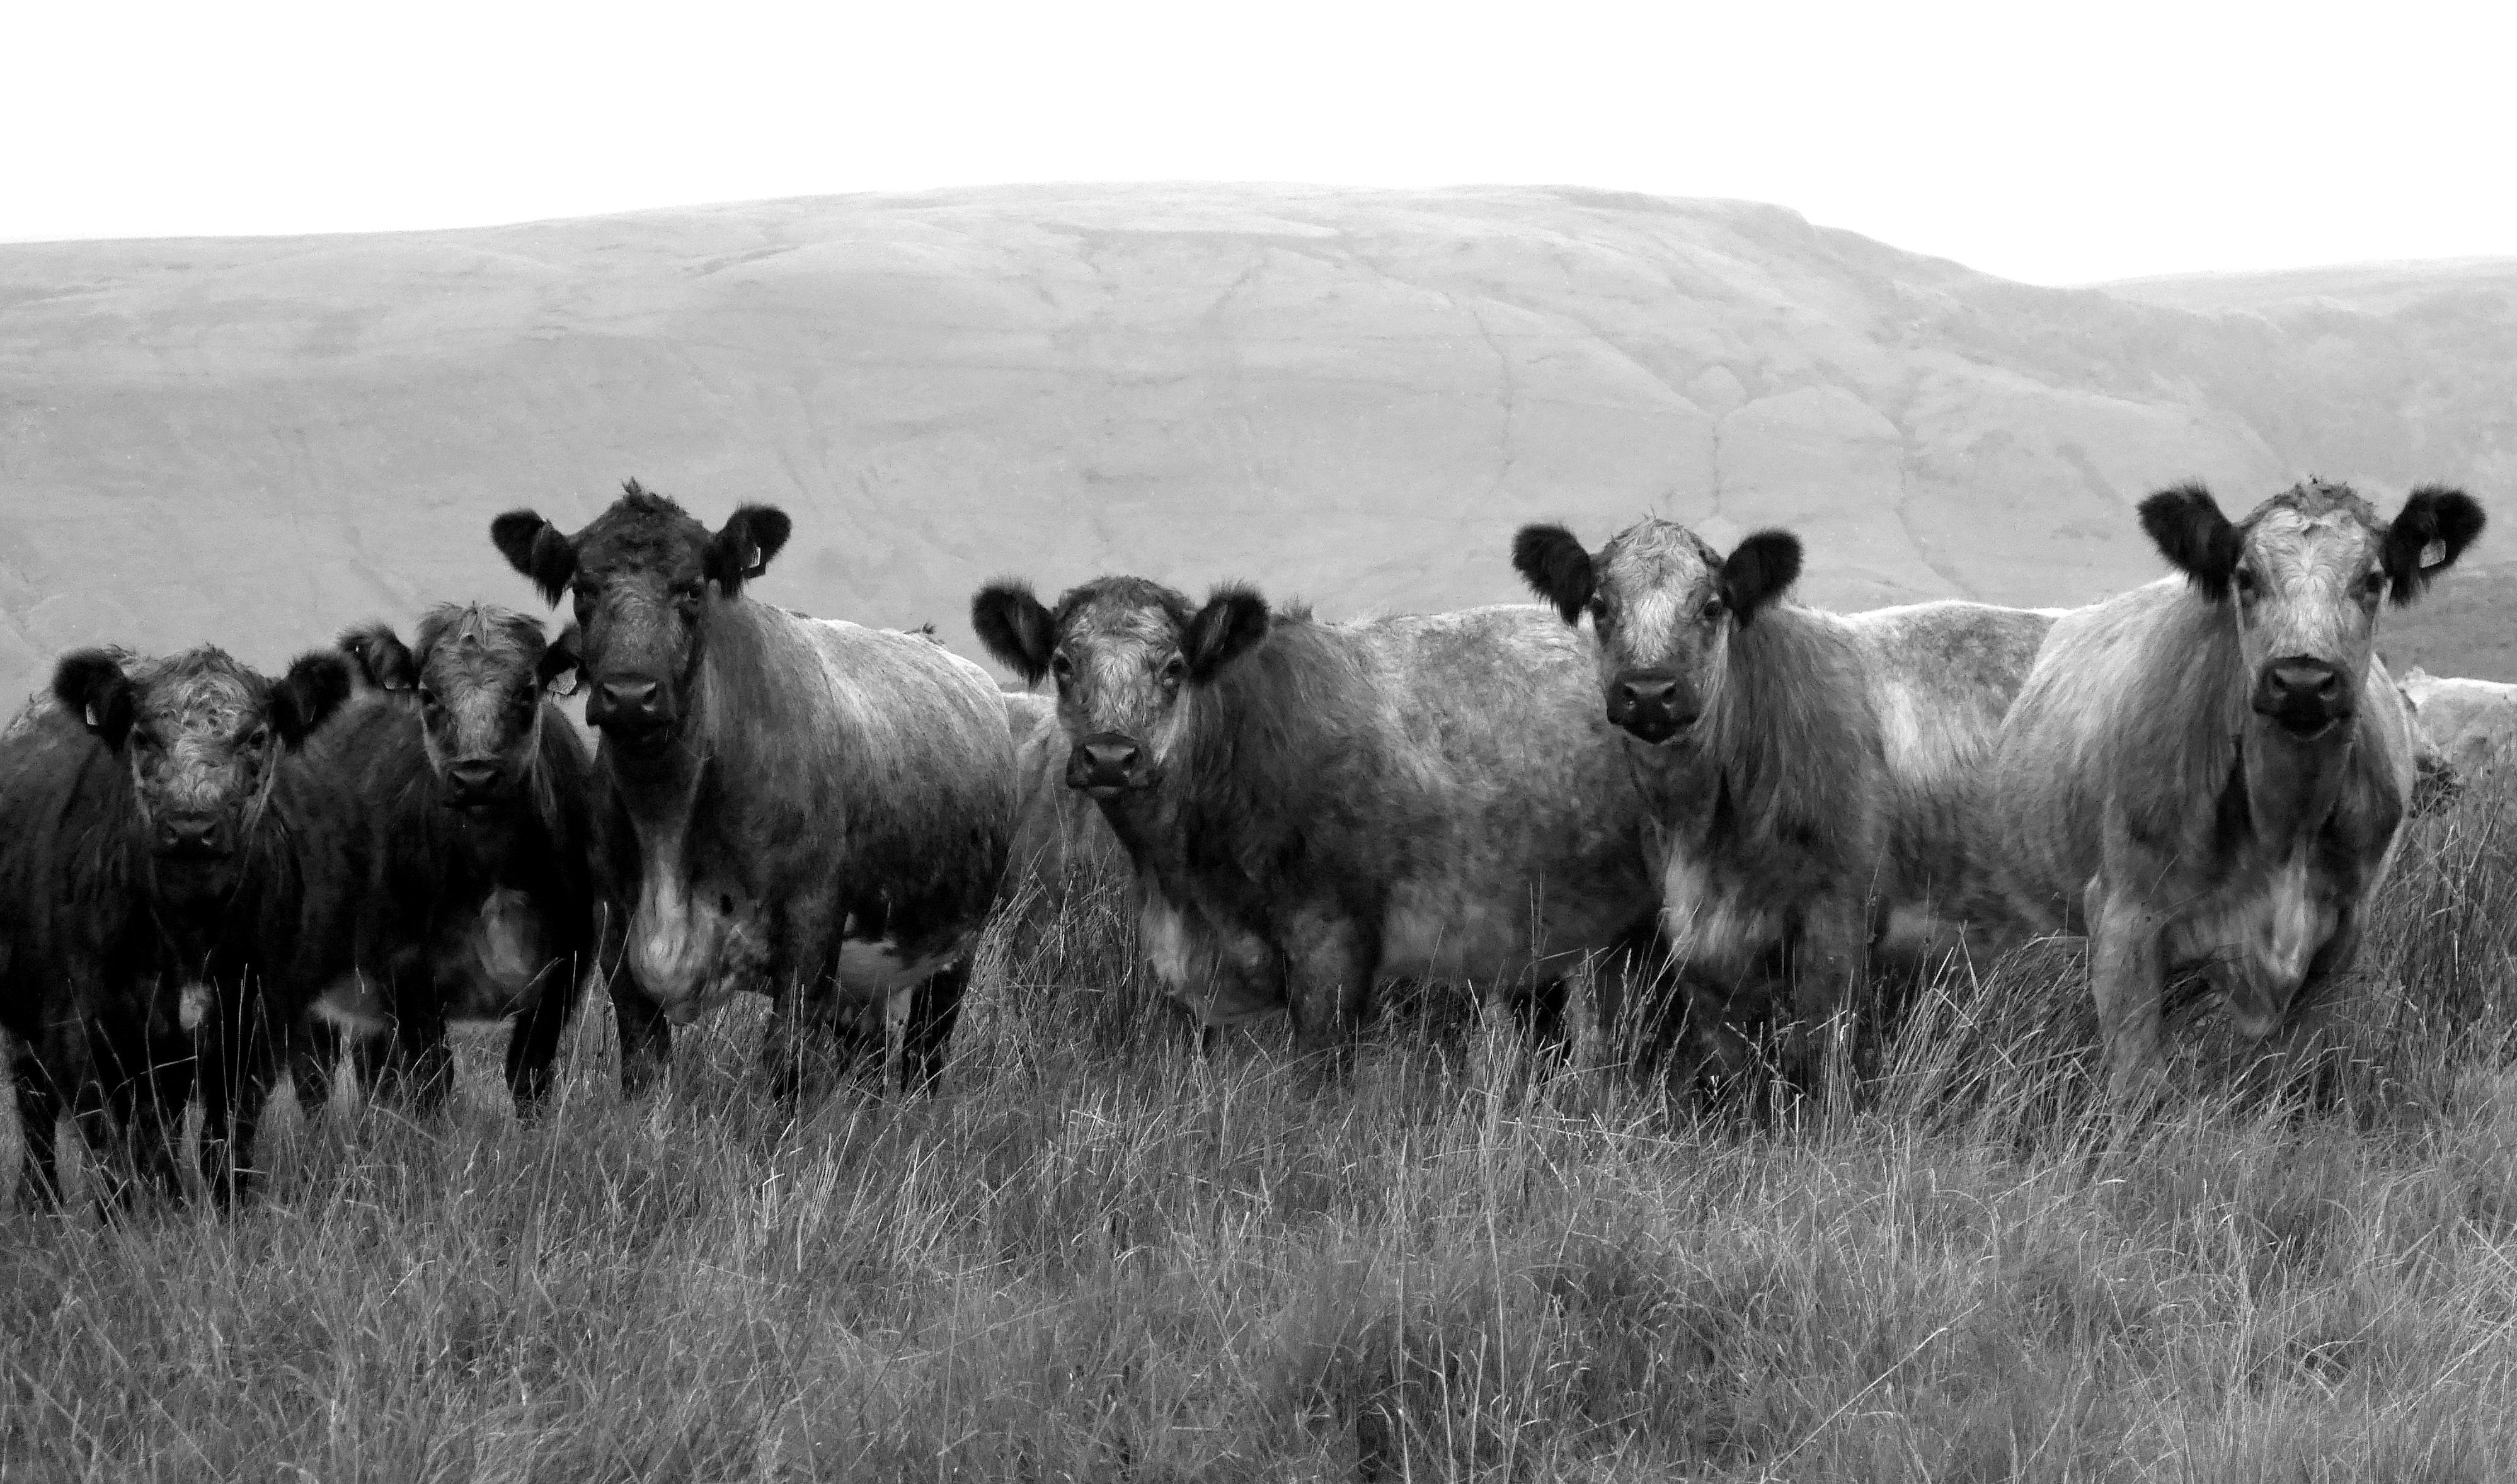 Wallpaper Cattle Like Mammal Black And White Wildlife Monochrome Photography Grassland Fauna Herd Pasture Grass Cow Goat Family Grazing Rural Area Livestock Sky Ranch Ecoregion Dairy Cow Calf Prairie 3995x2356